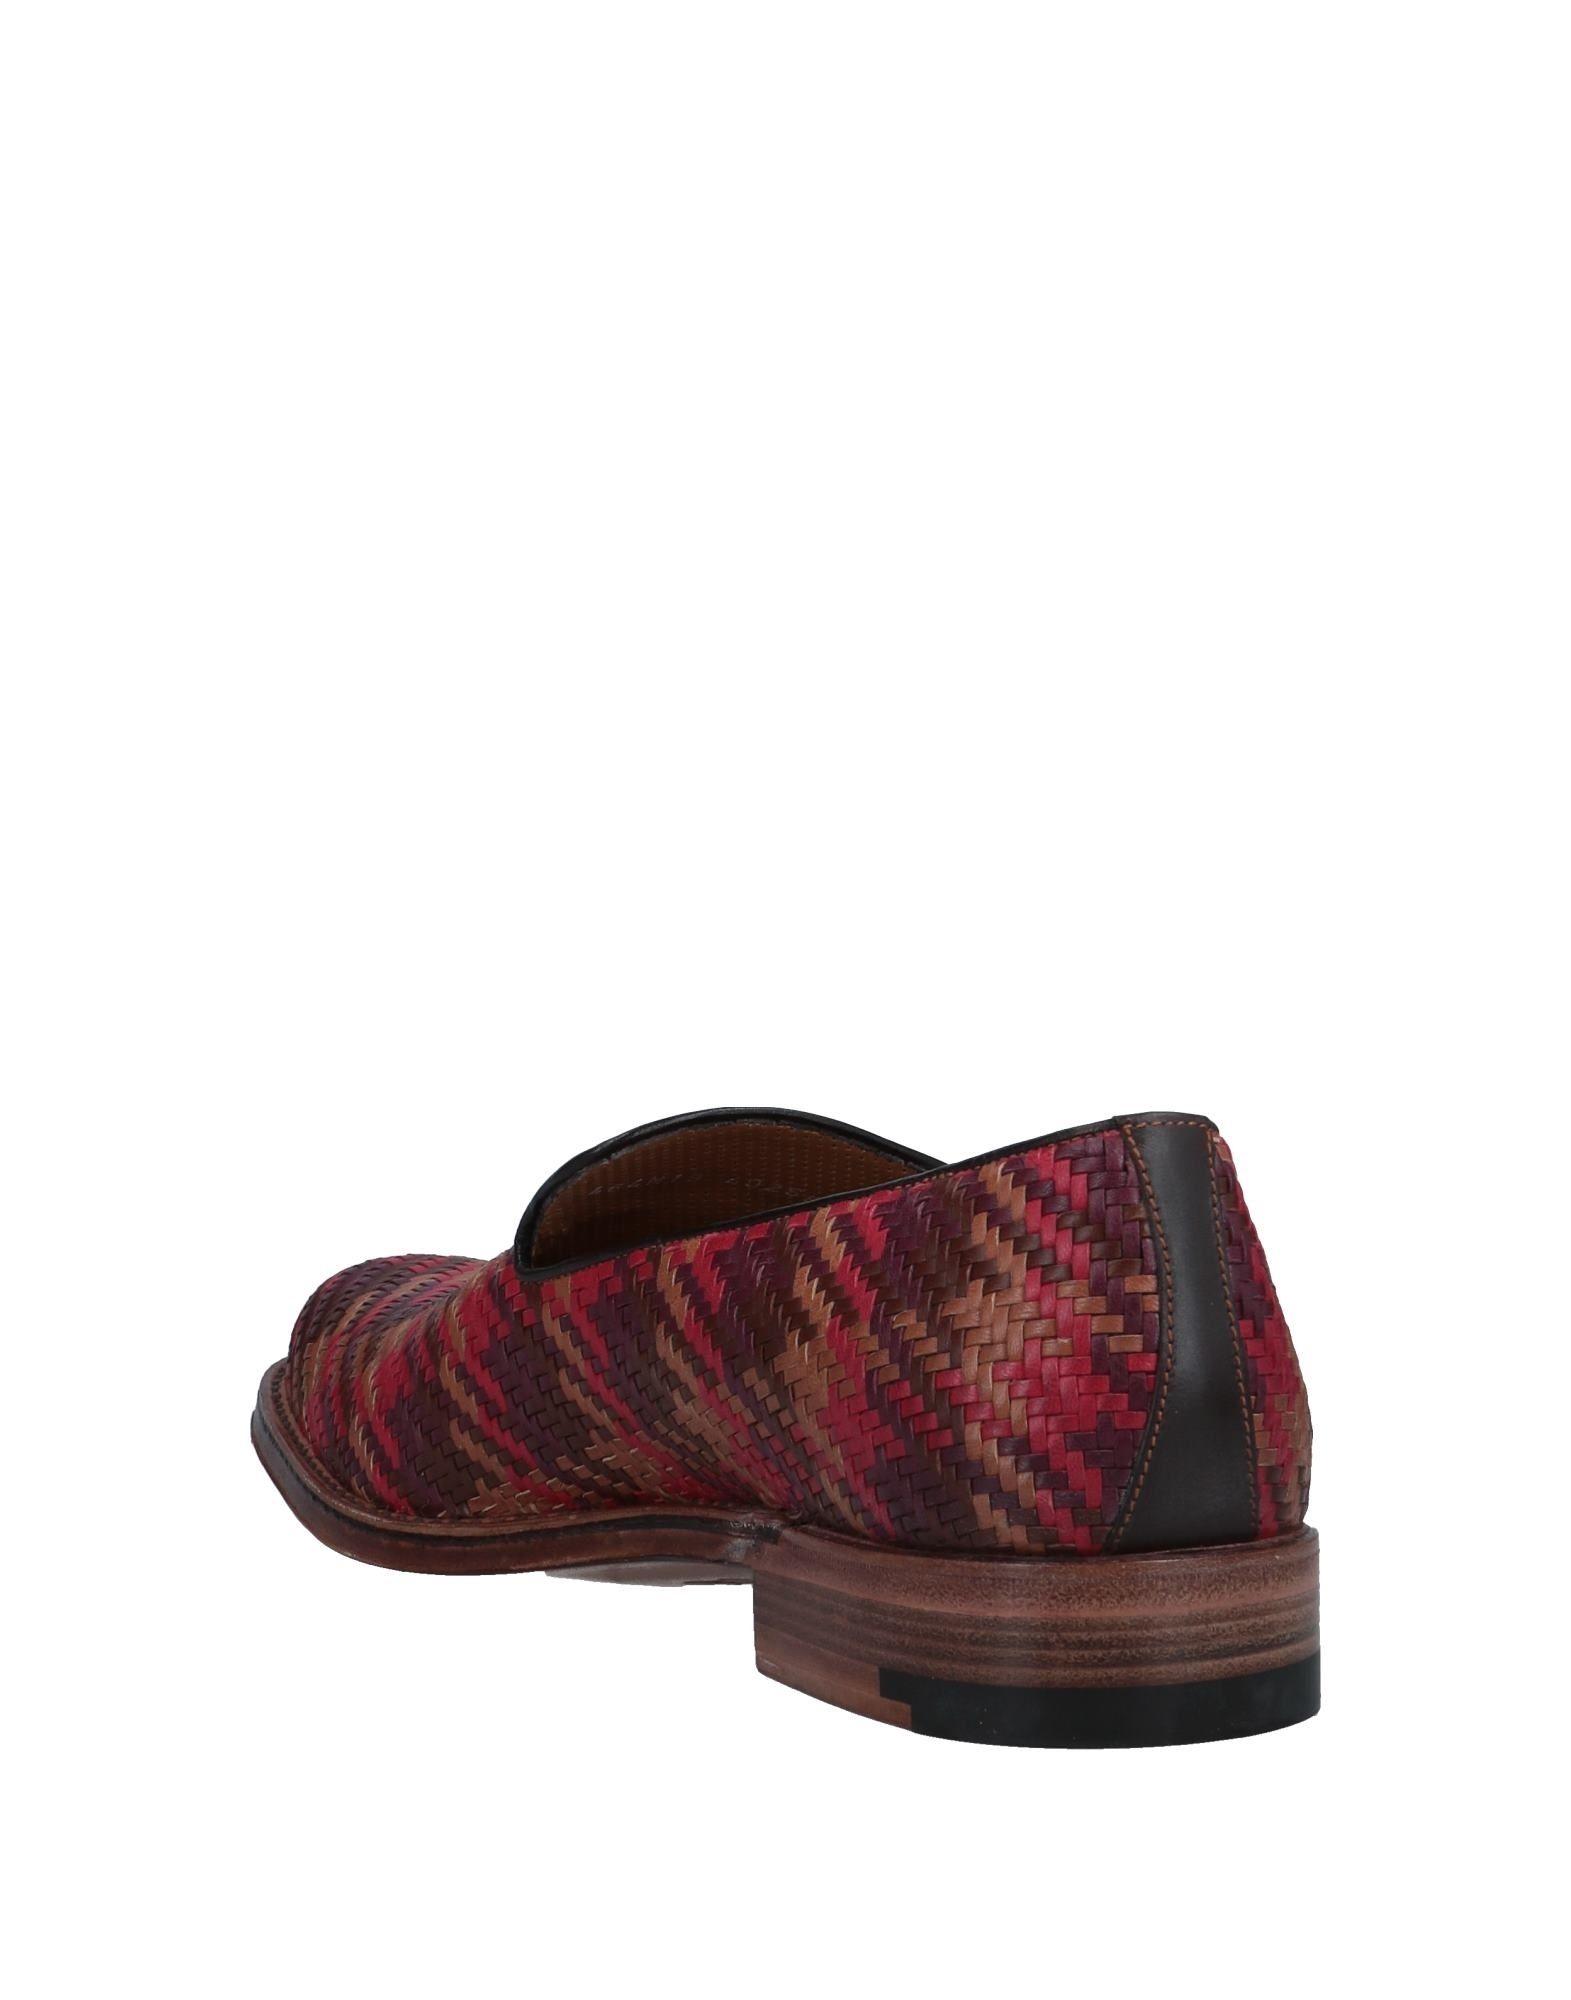 A.Testoni A.Testoni A.Testoni Loafers - Men A.Testoni Loafers online on  Canada - 11549932CW 1af459